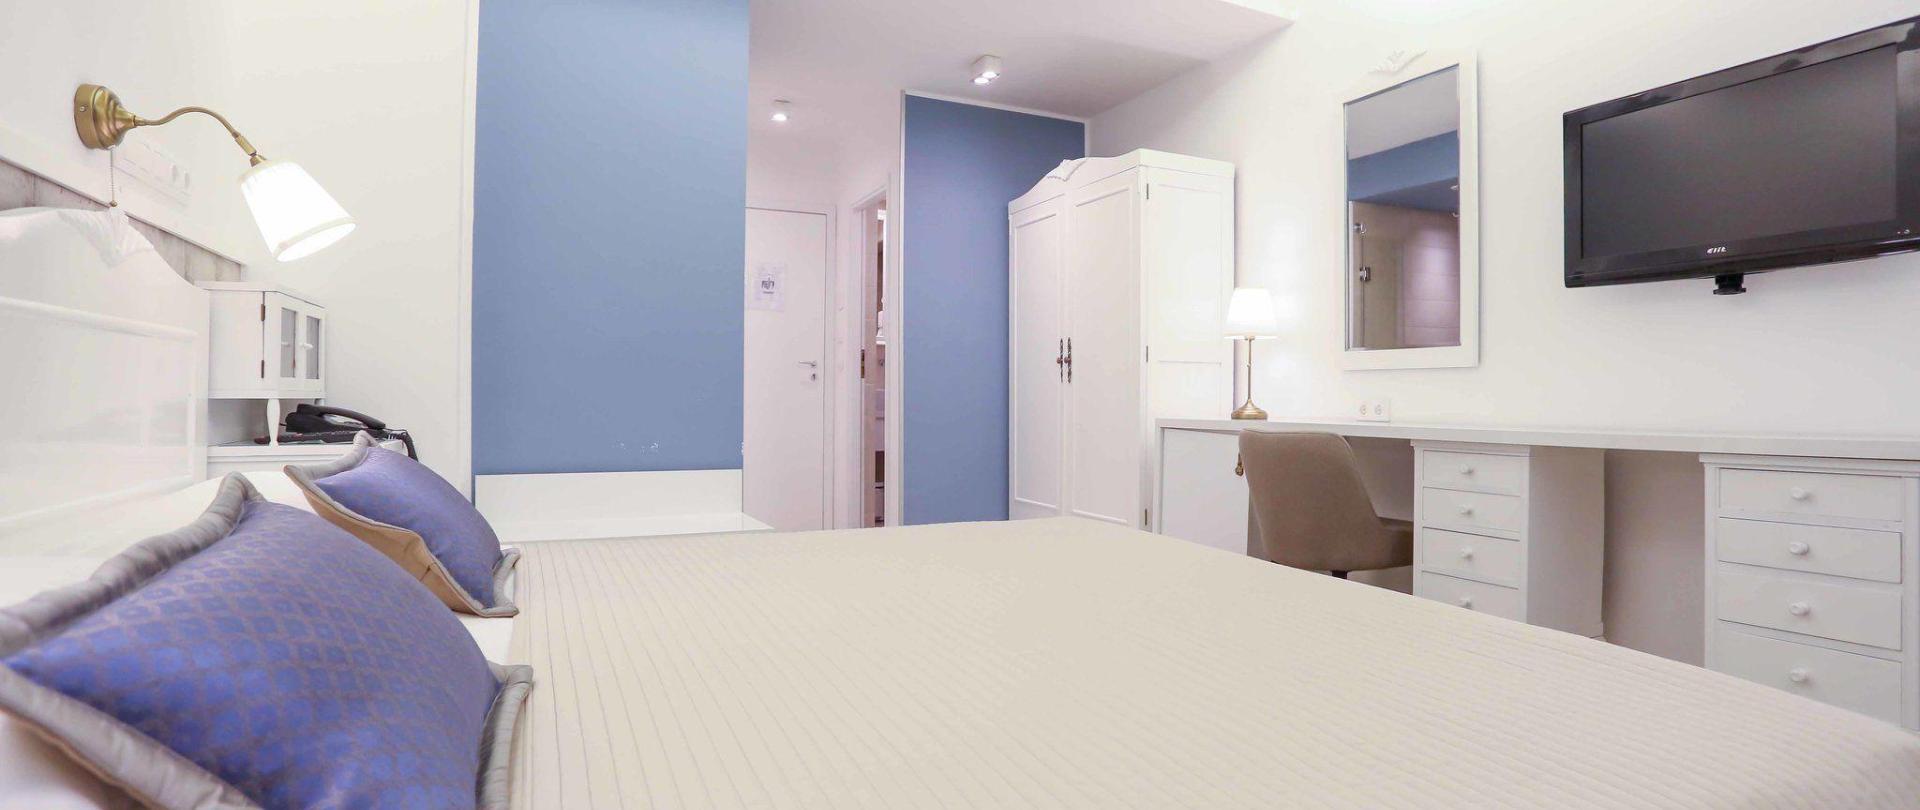 hotel-divan-by-dzenat-drekovic-29-08-2016-1.jpg